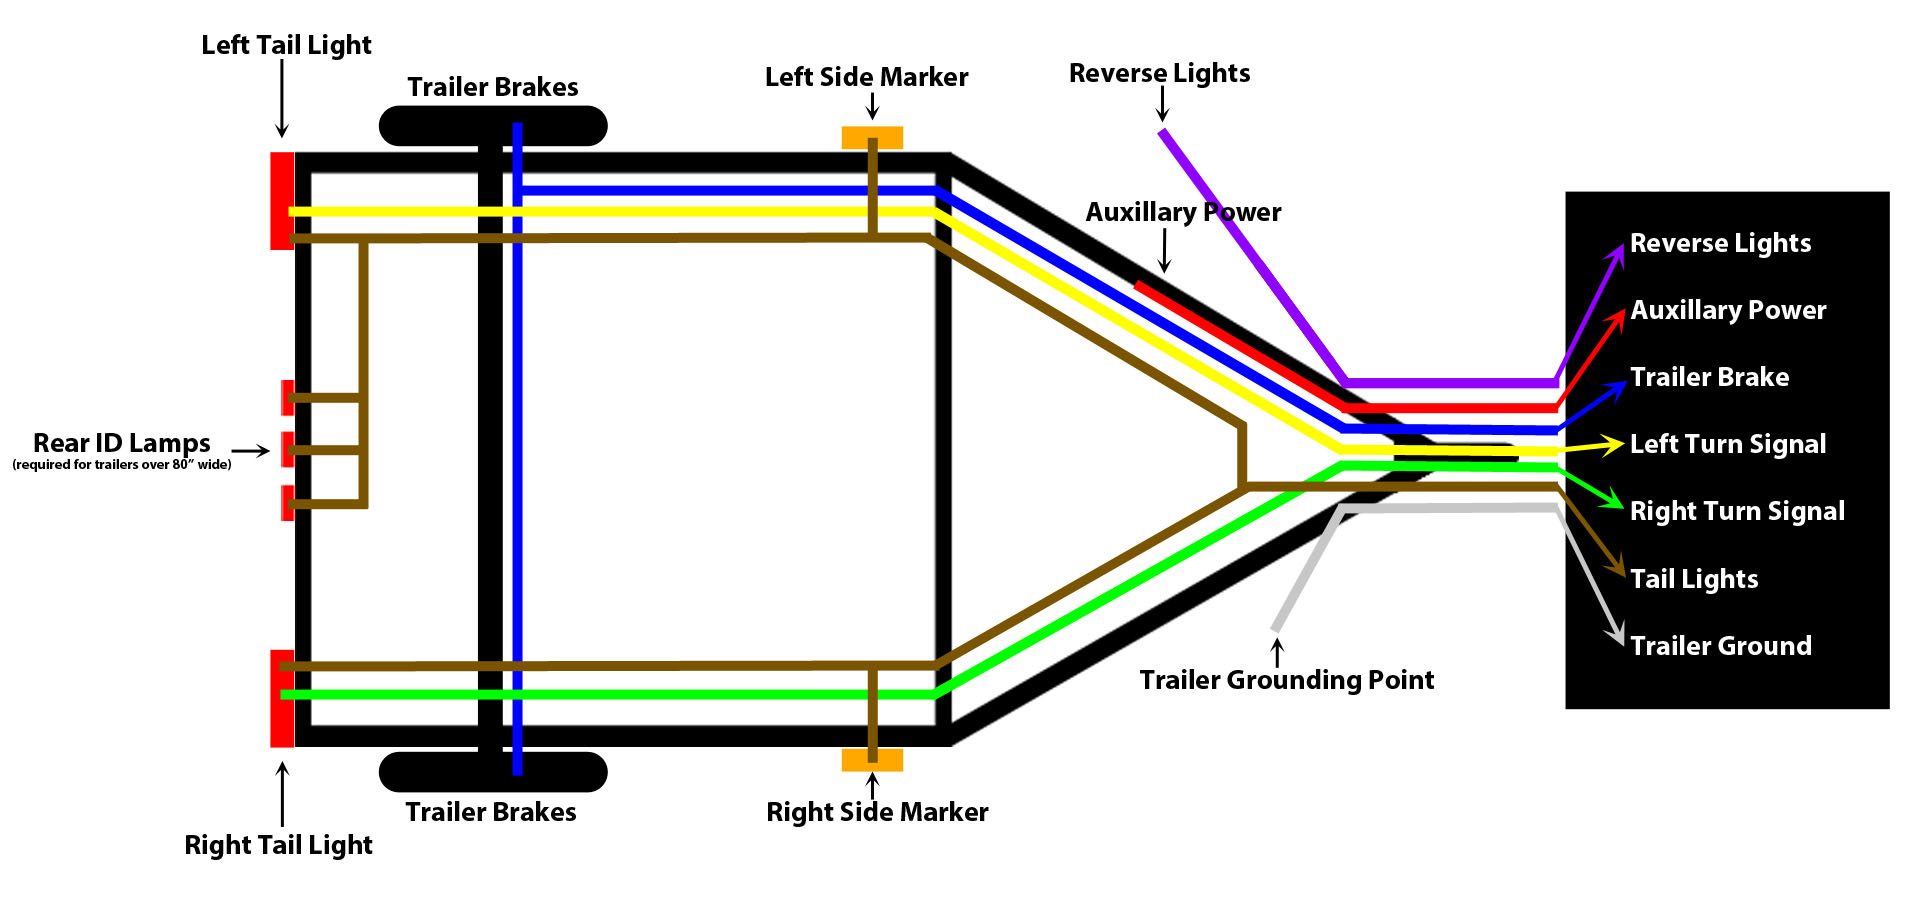 5 Pin Trailer Wiring Diagram | Wiring Diagram  Wire Trailer Plug Wiring on u-haul 4-way flat wiring, 4 wire trailer wire roll, 4 wire trailer connector, 4 wire trailer wiring harness, 4 wire trailer diagram, 4 wire trailer light wiring, 5 wire trailer wiring,